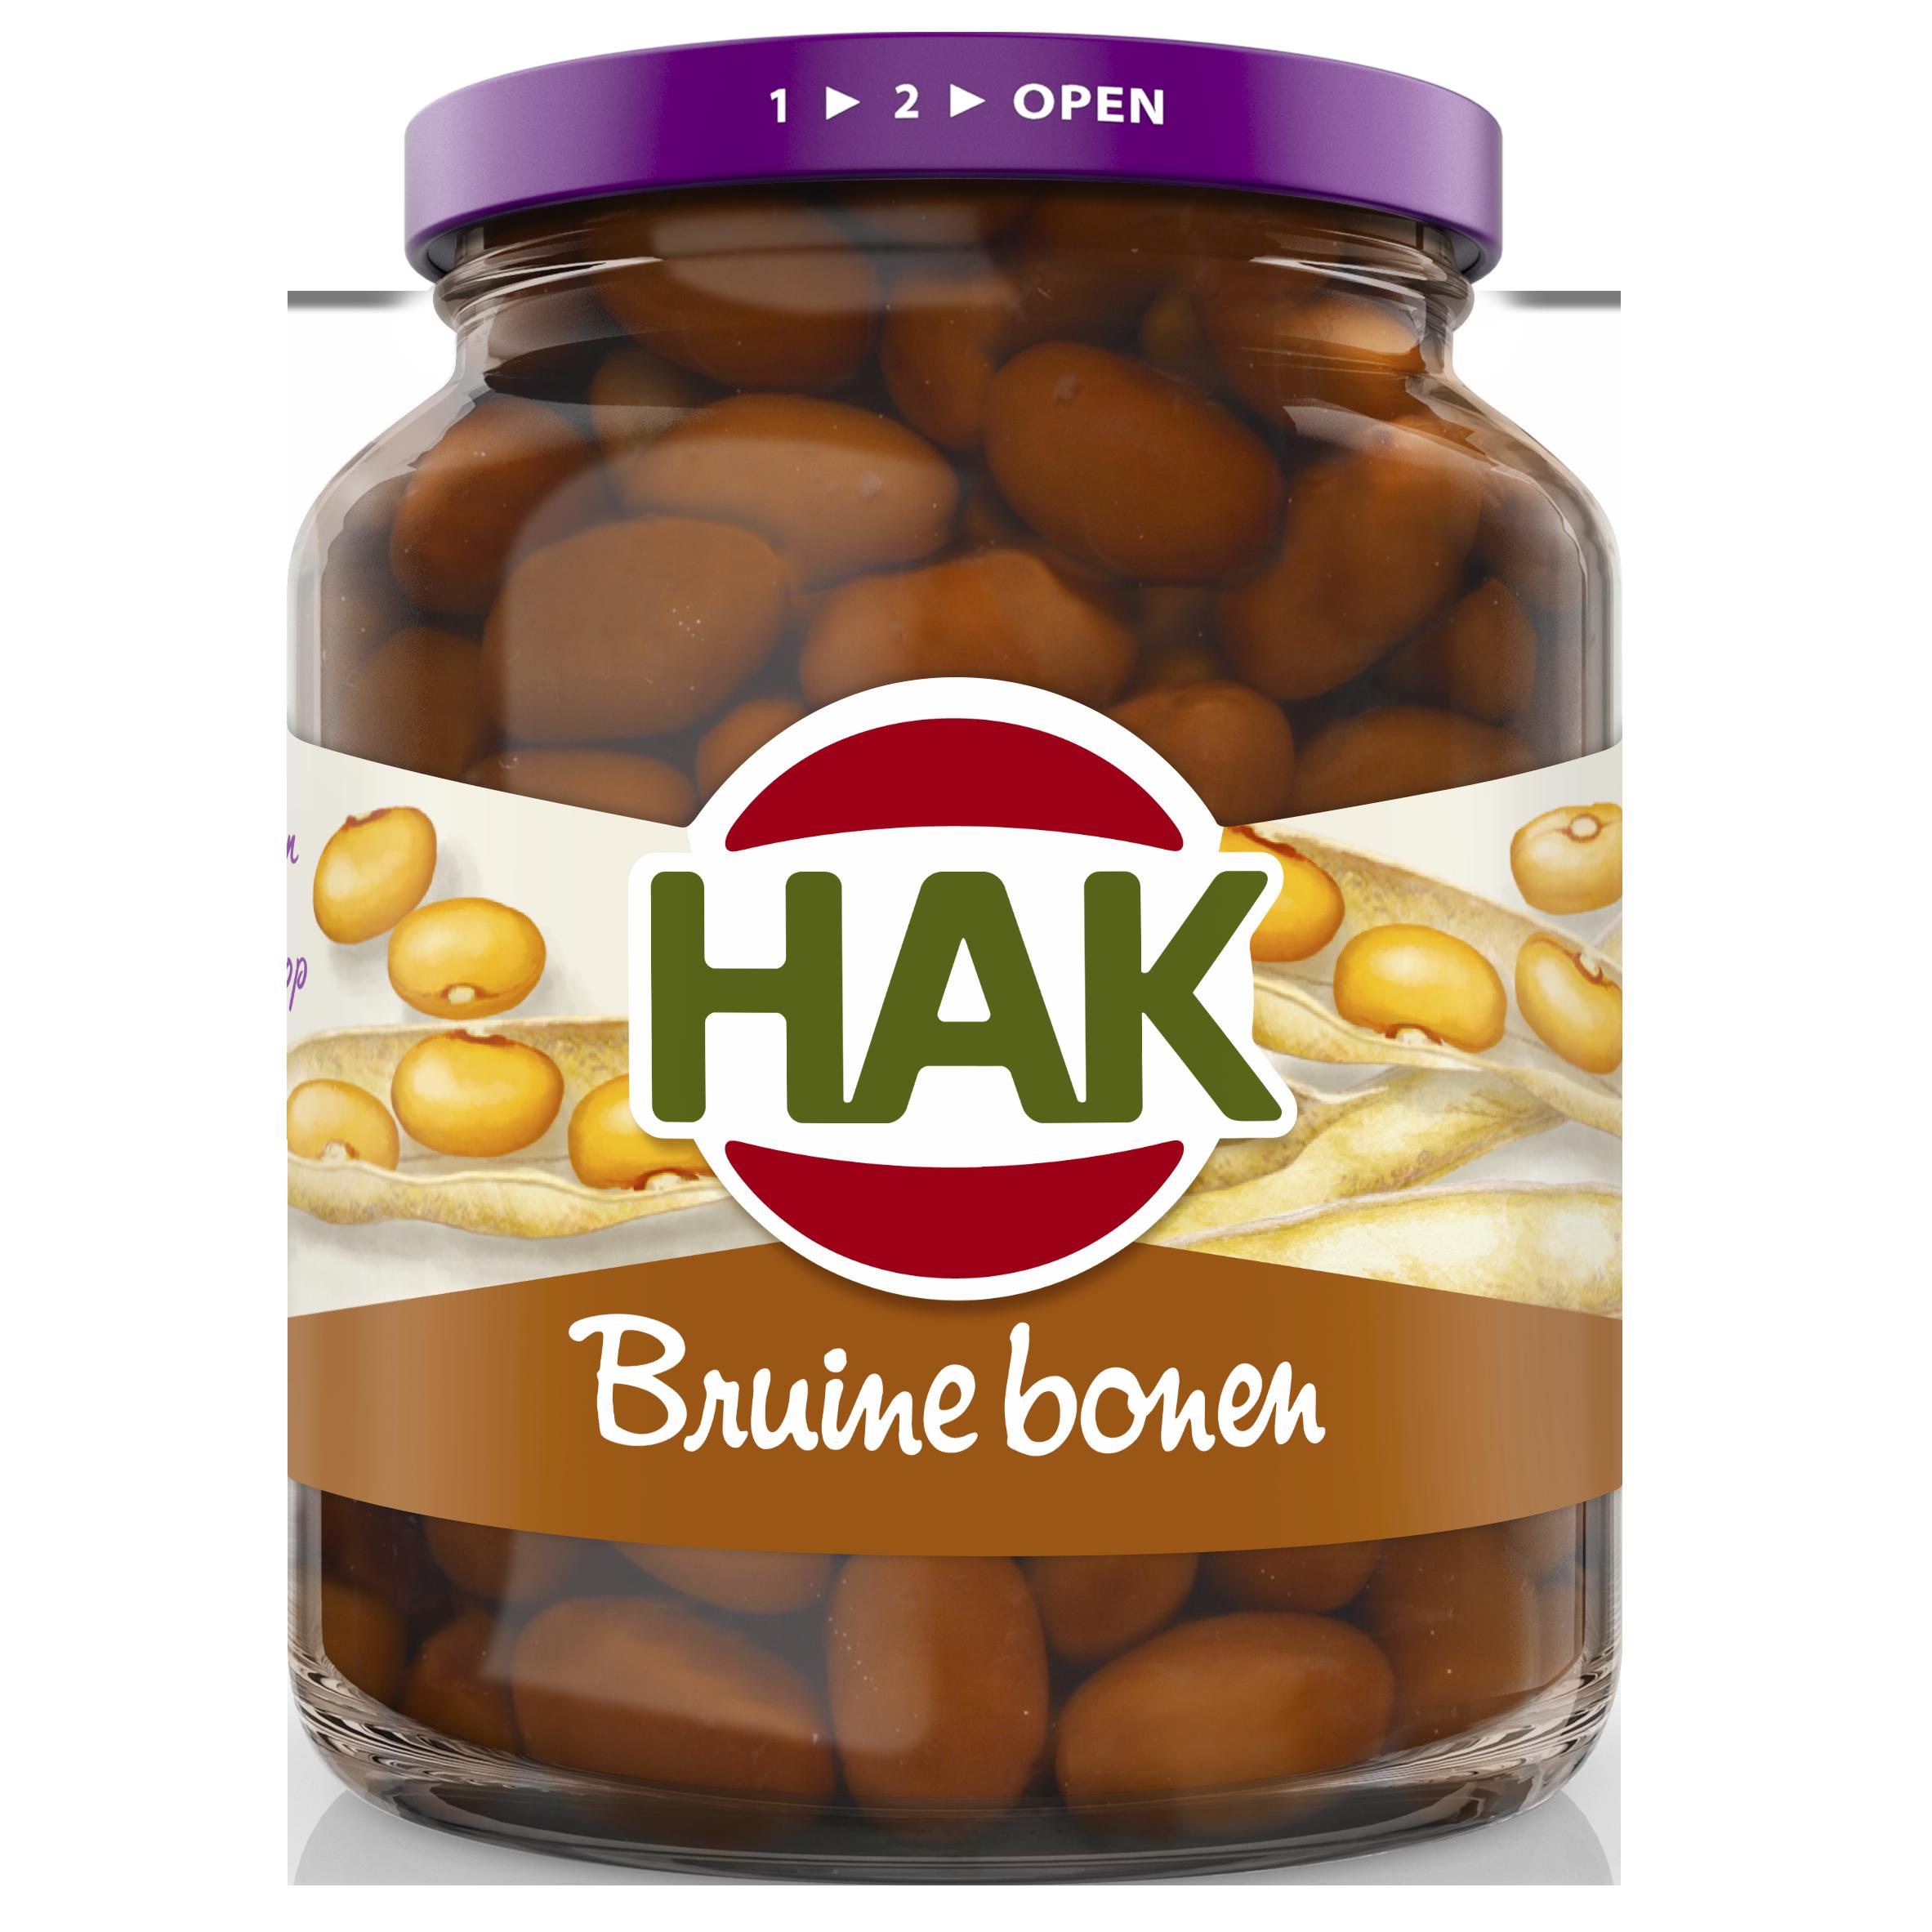 Hak Bruine Bonen 370 Nl 8720600612824 1710070 Front